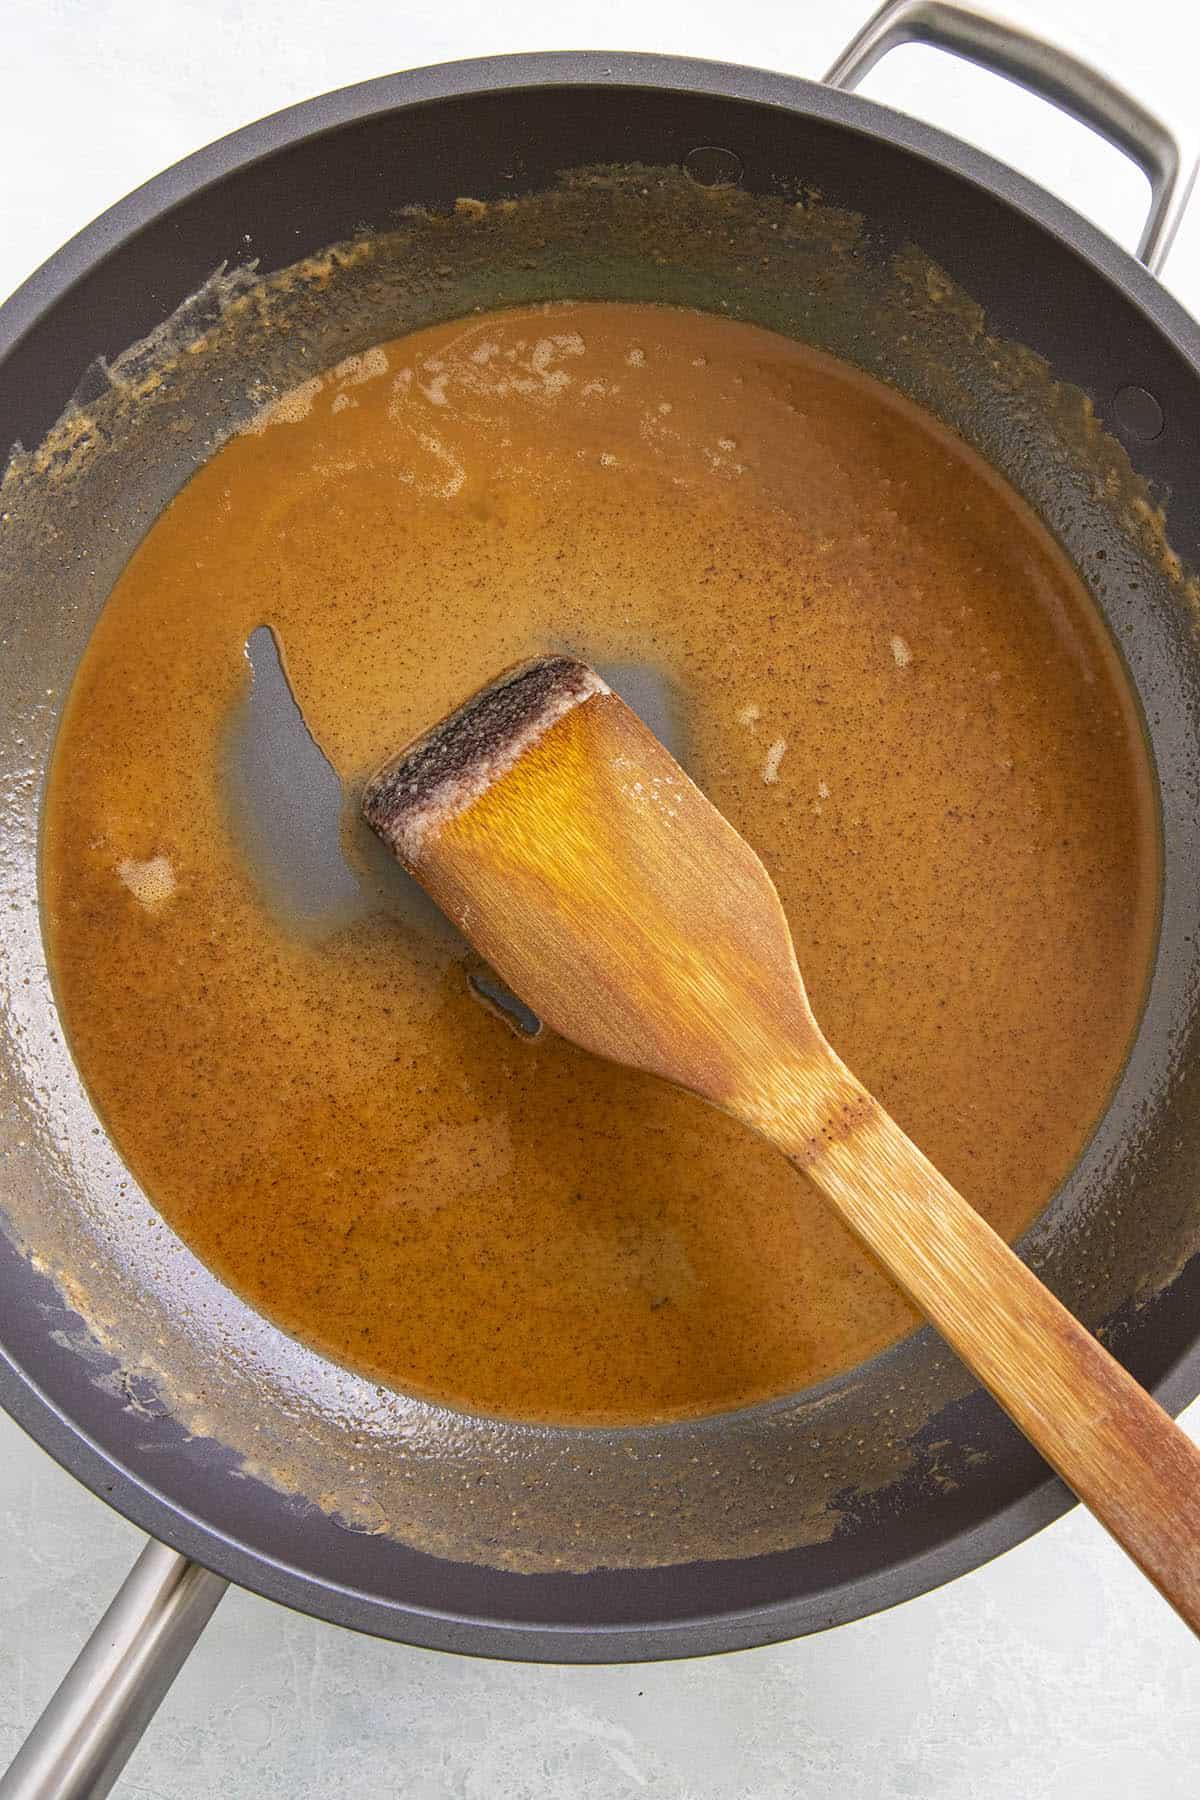 Cooking the roux to make Crawfish Etouffee